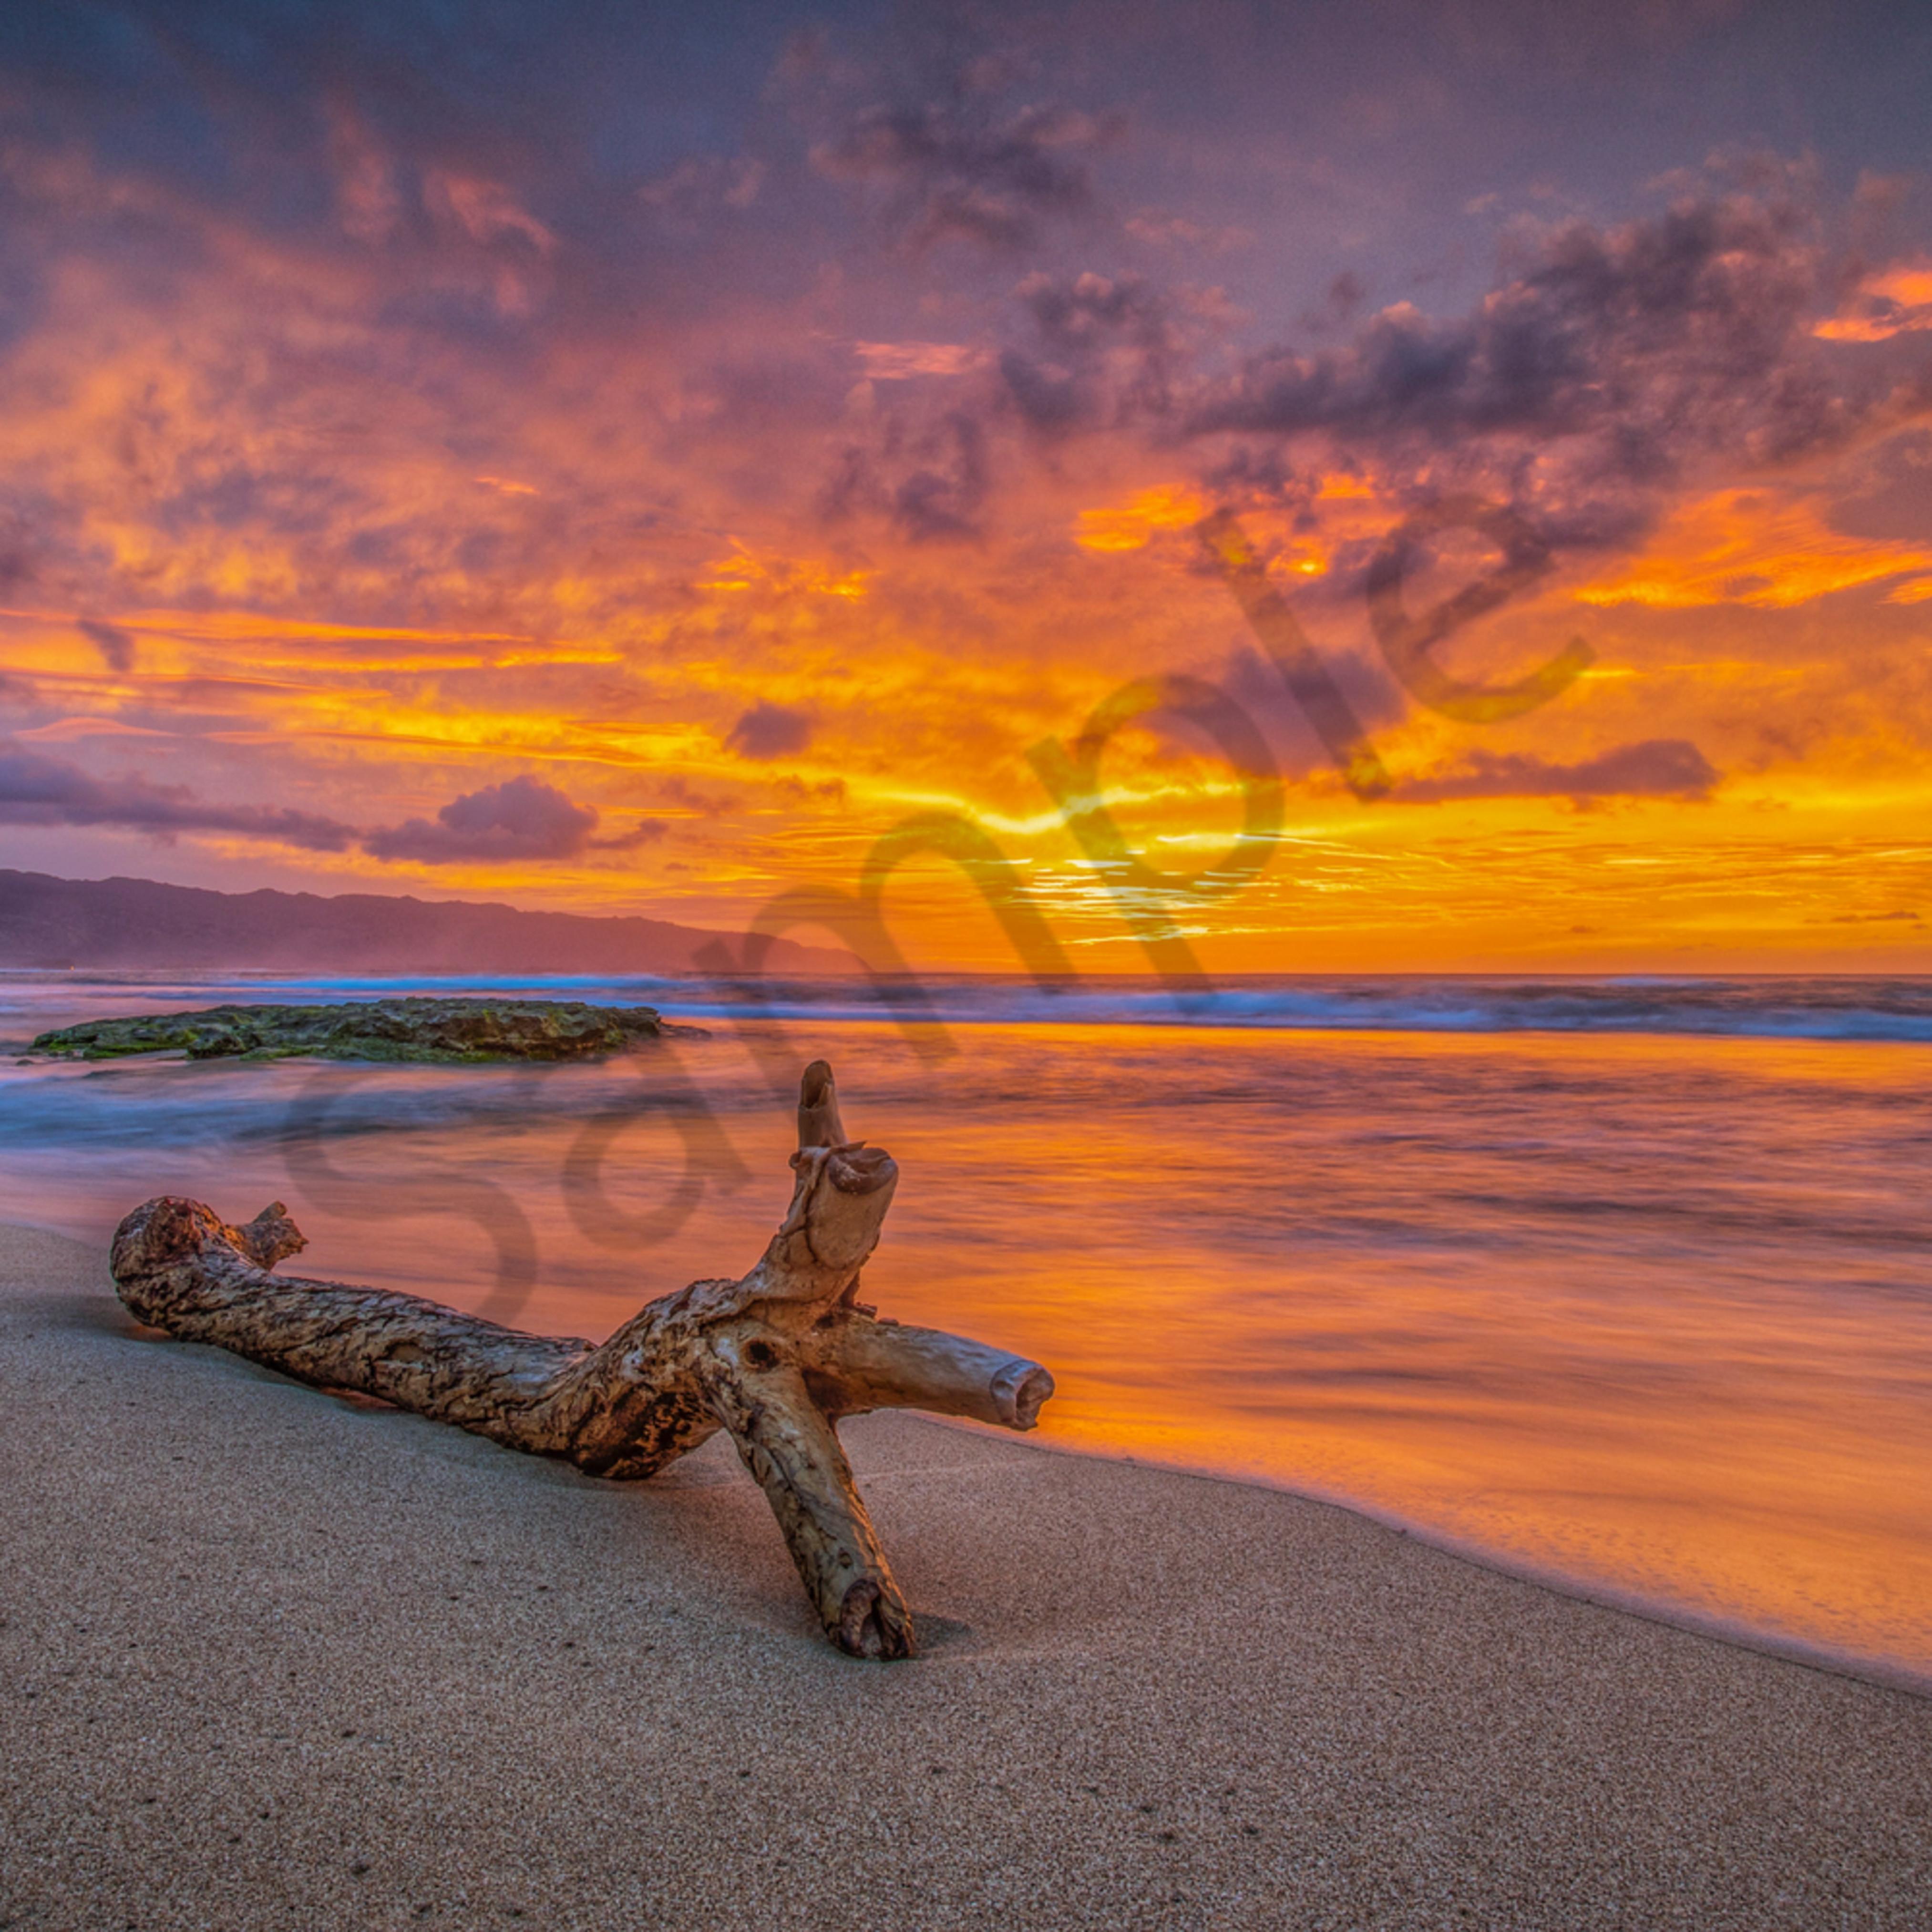 Heavenly north shore sunset ww59 wohrkp